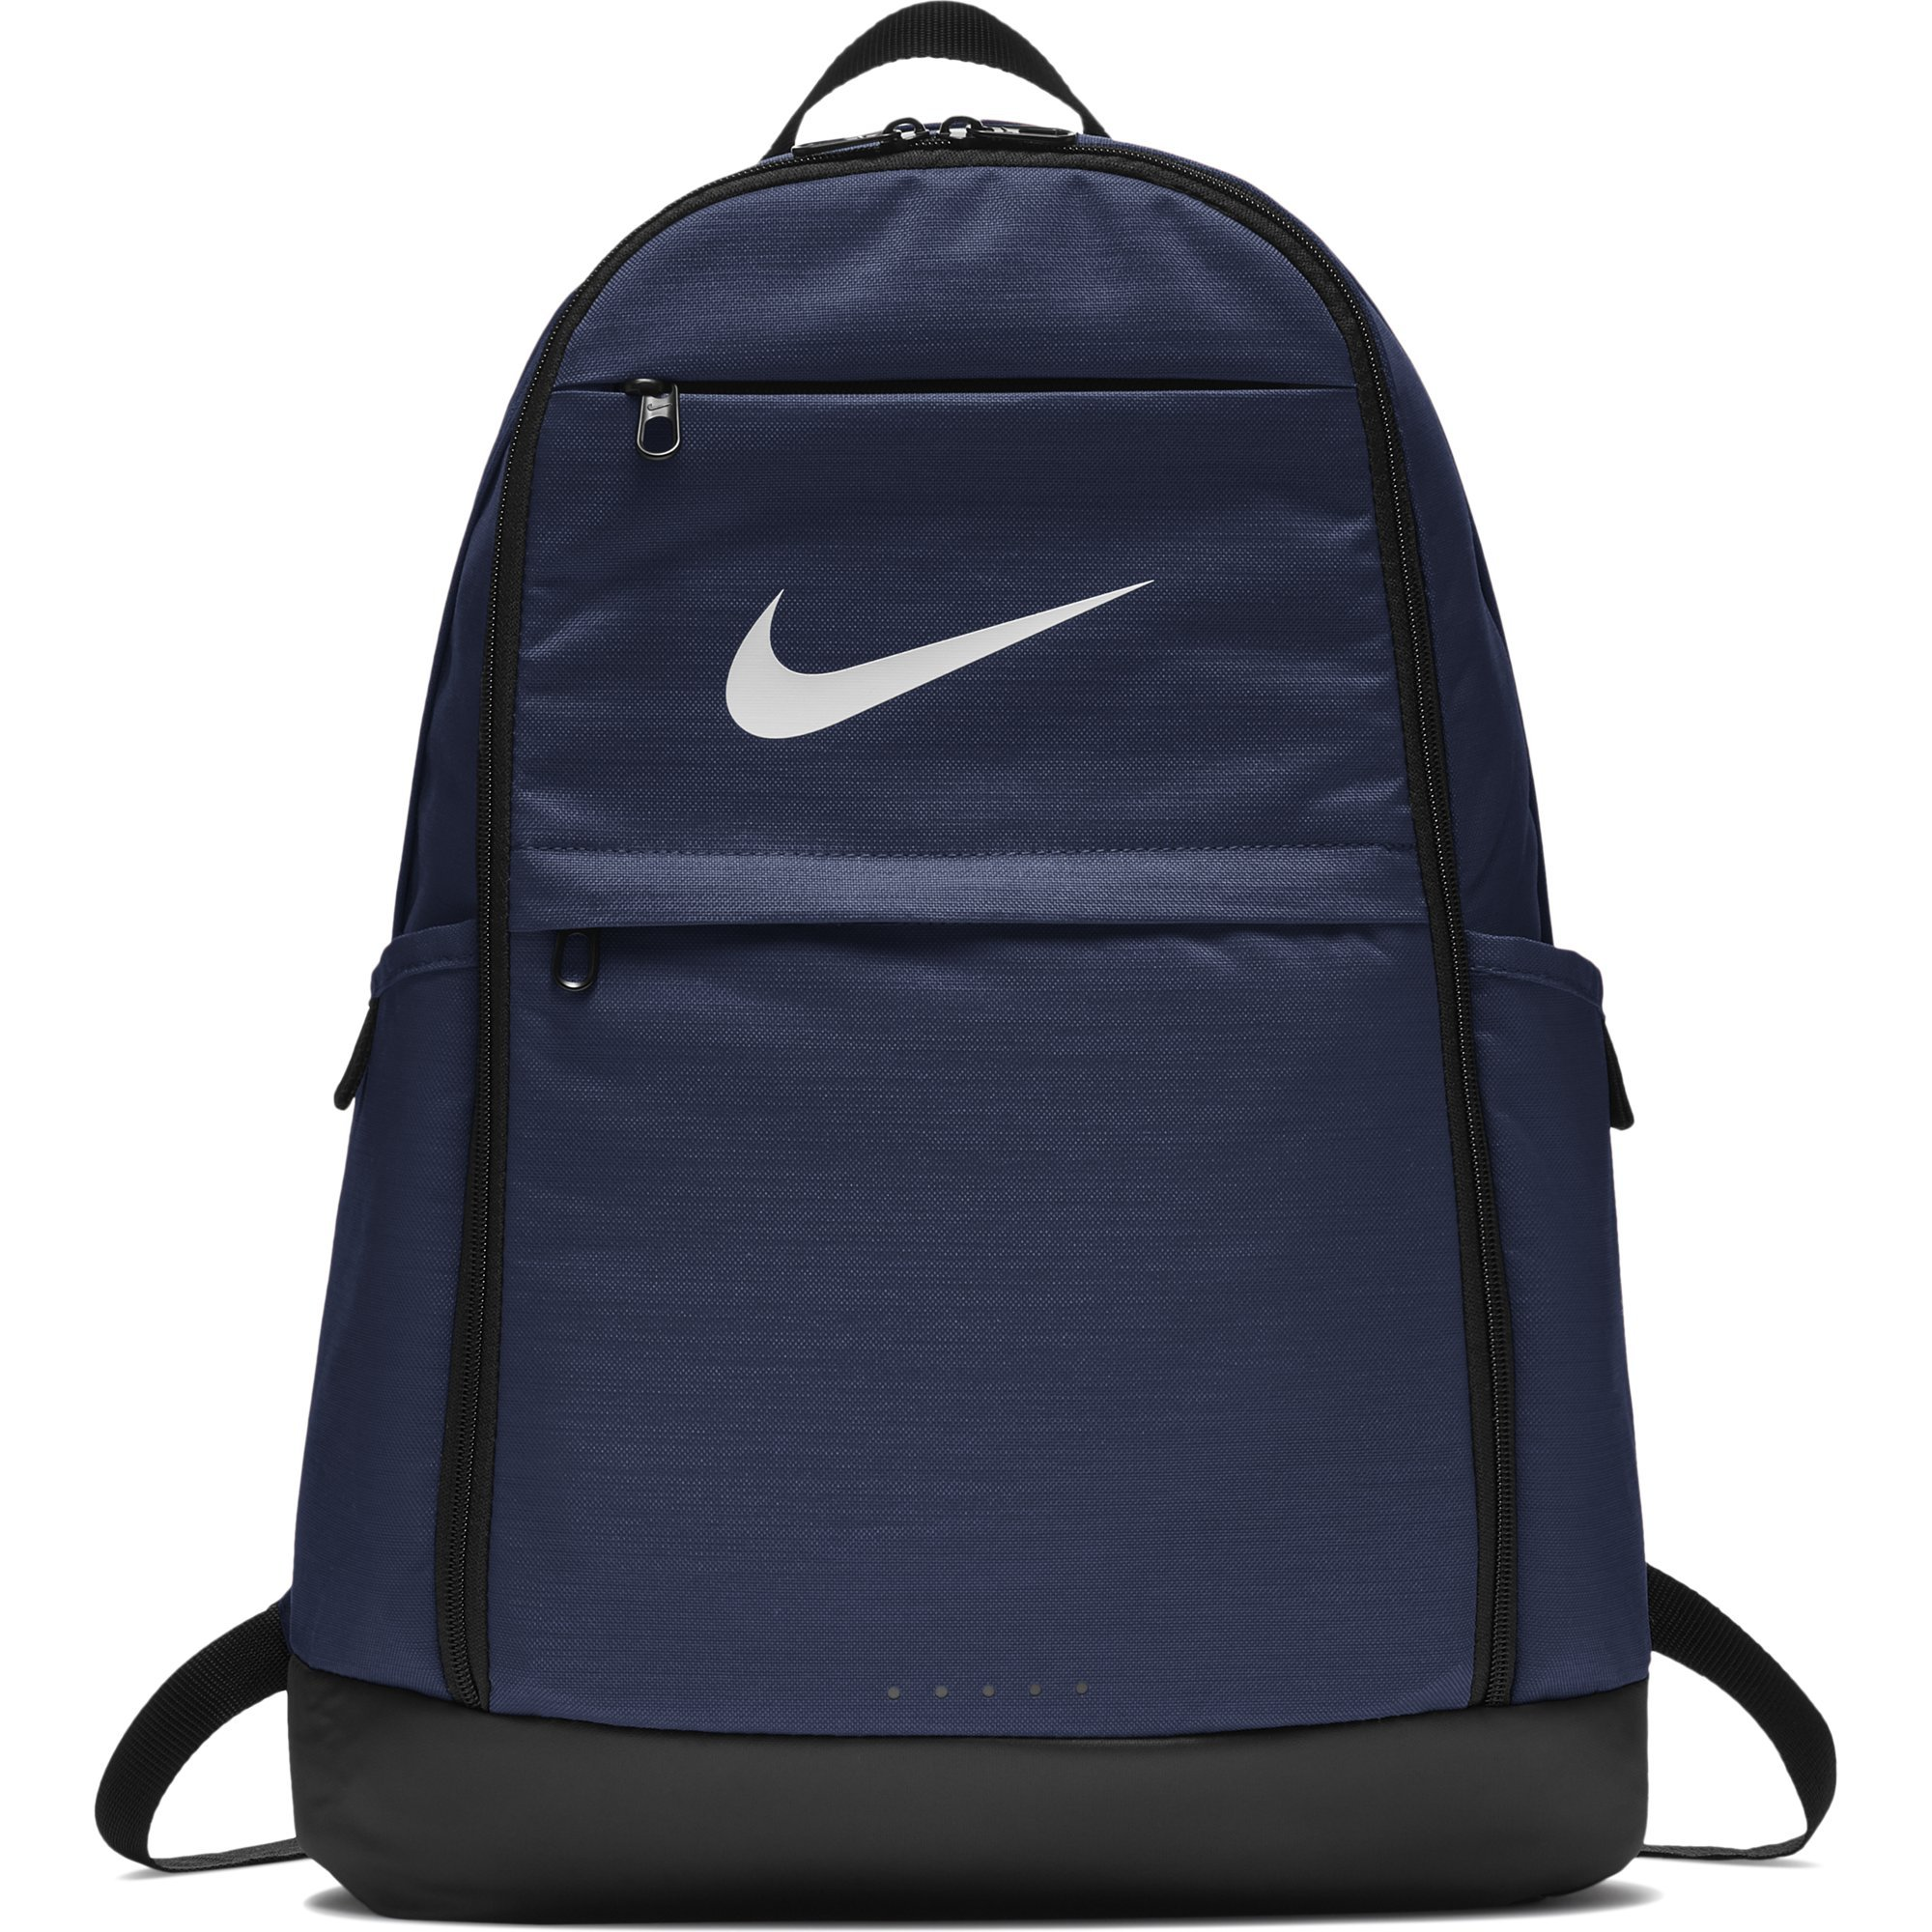 NIKE unisex-adult Brasilia Xl Backpack Backpack, Midnight Navy/Black/White, Misc